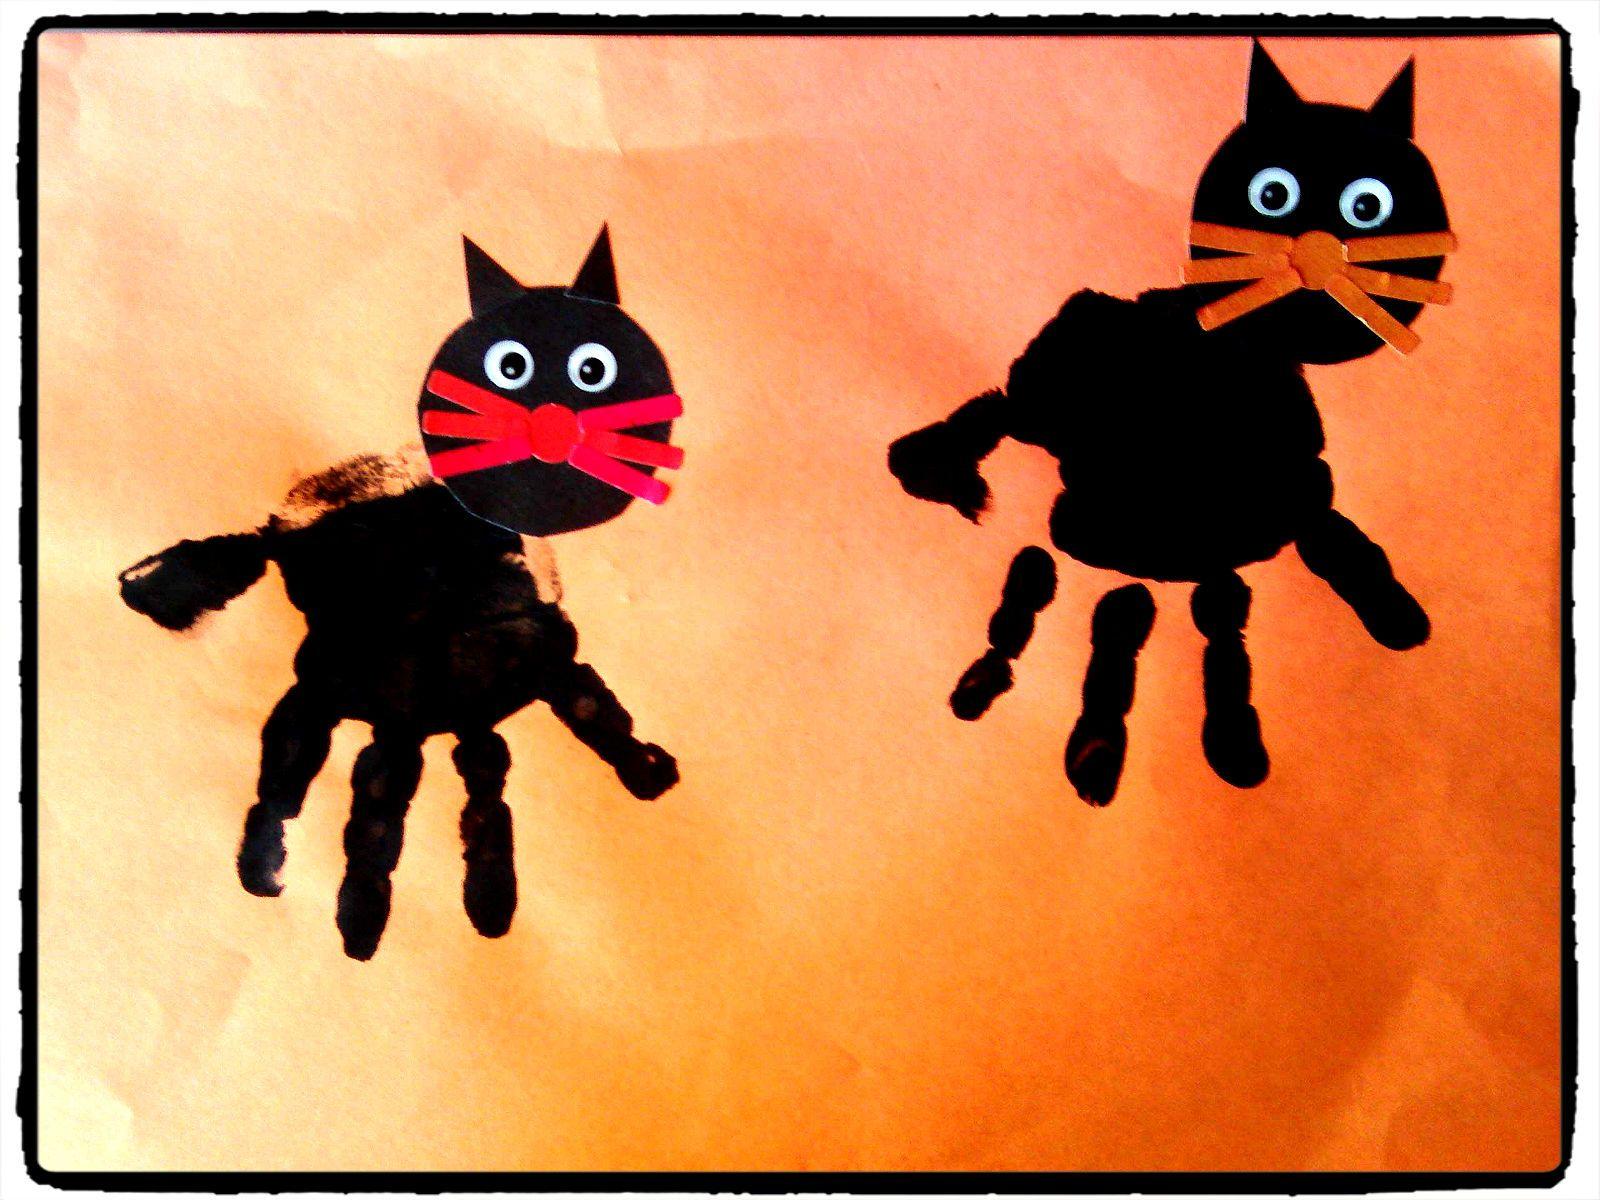 halloween empreinte de mains chat noir activit b b activit enfant halloween pinterest. Black Bedroom Furniture Sets. Home Design Ideas